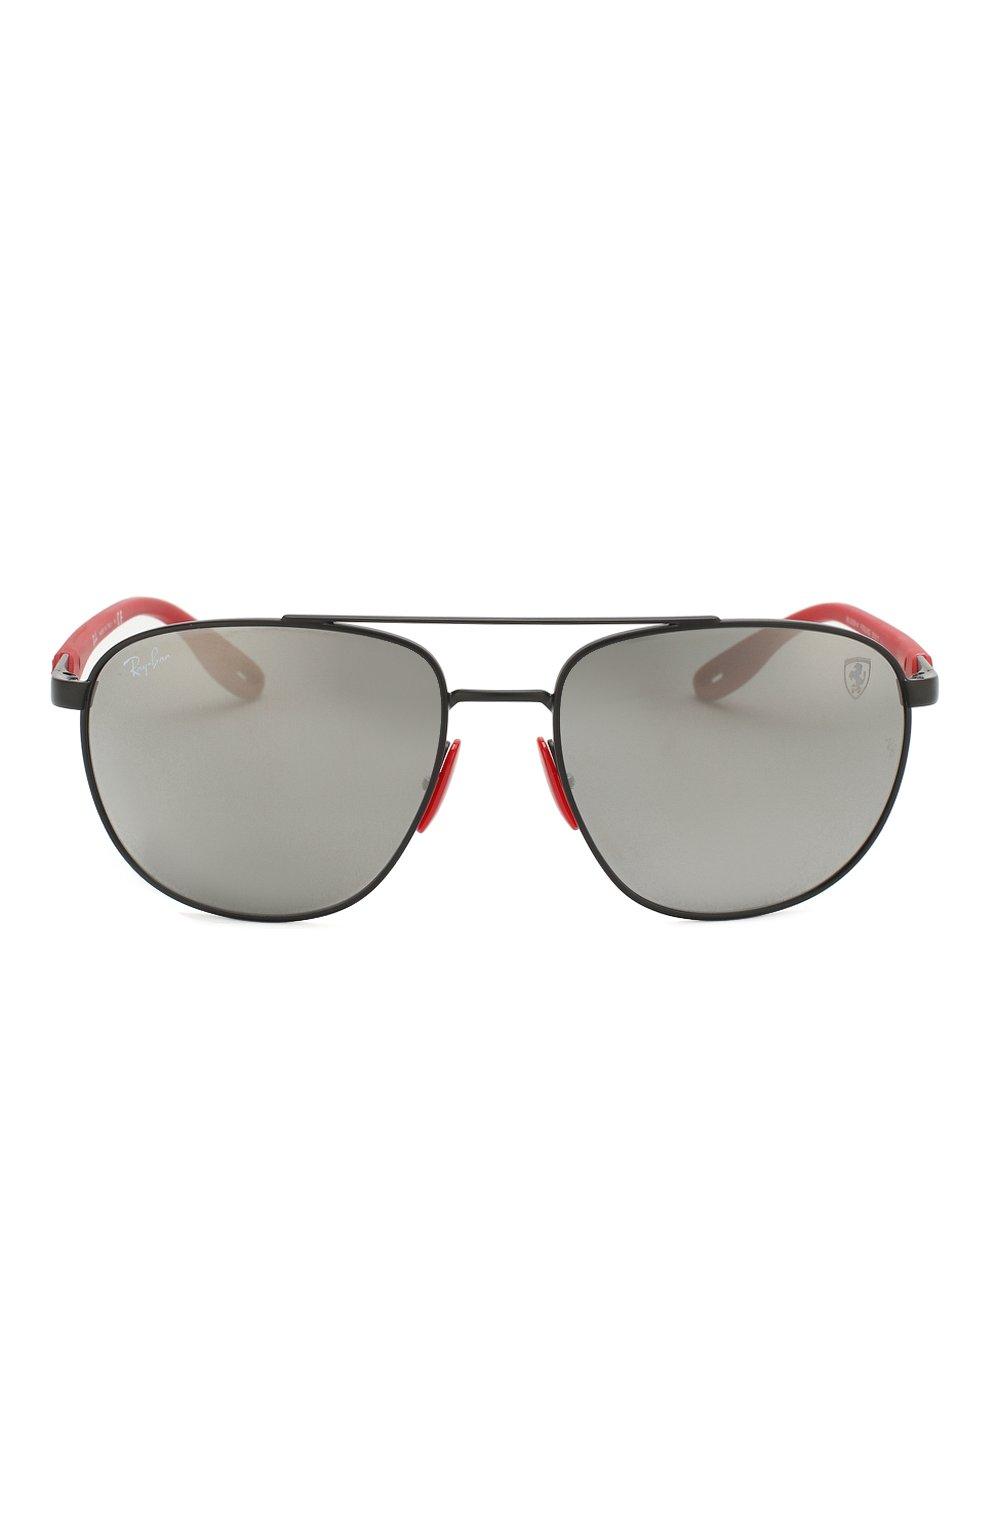 Мужские солнцезащитные очки RAY-BAN черного цвета, арт. 3659M-F0026G   Фото 3